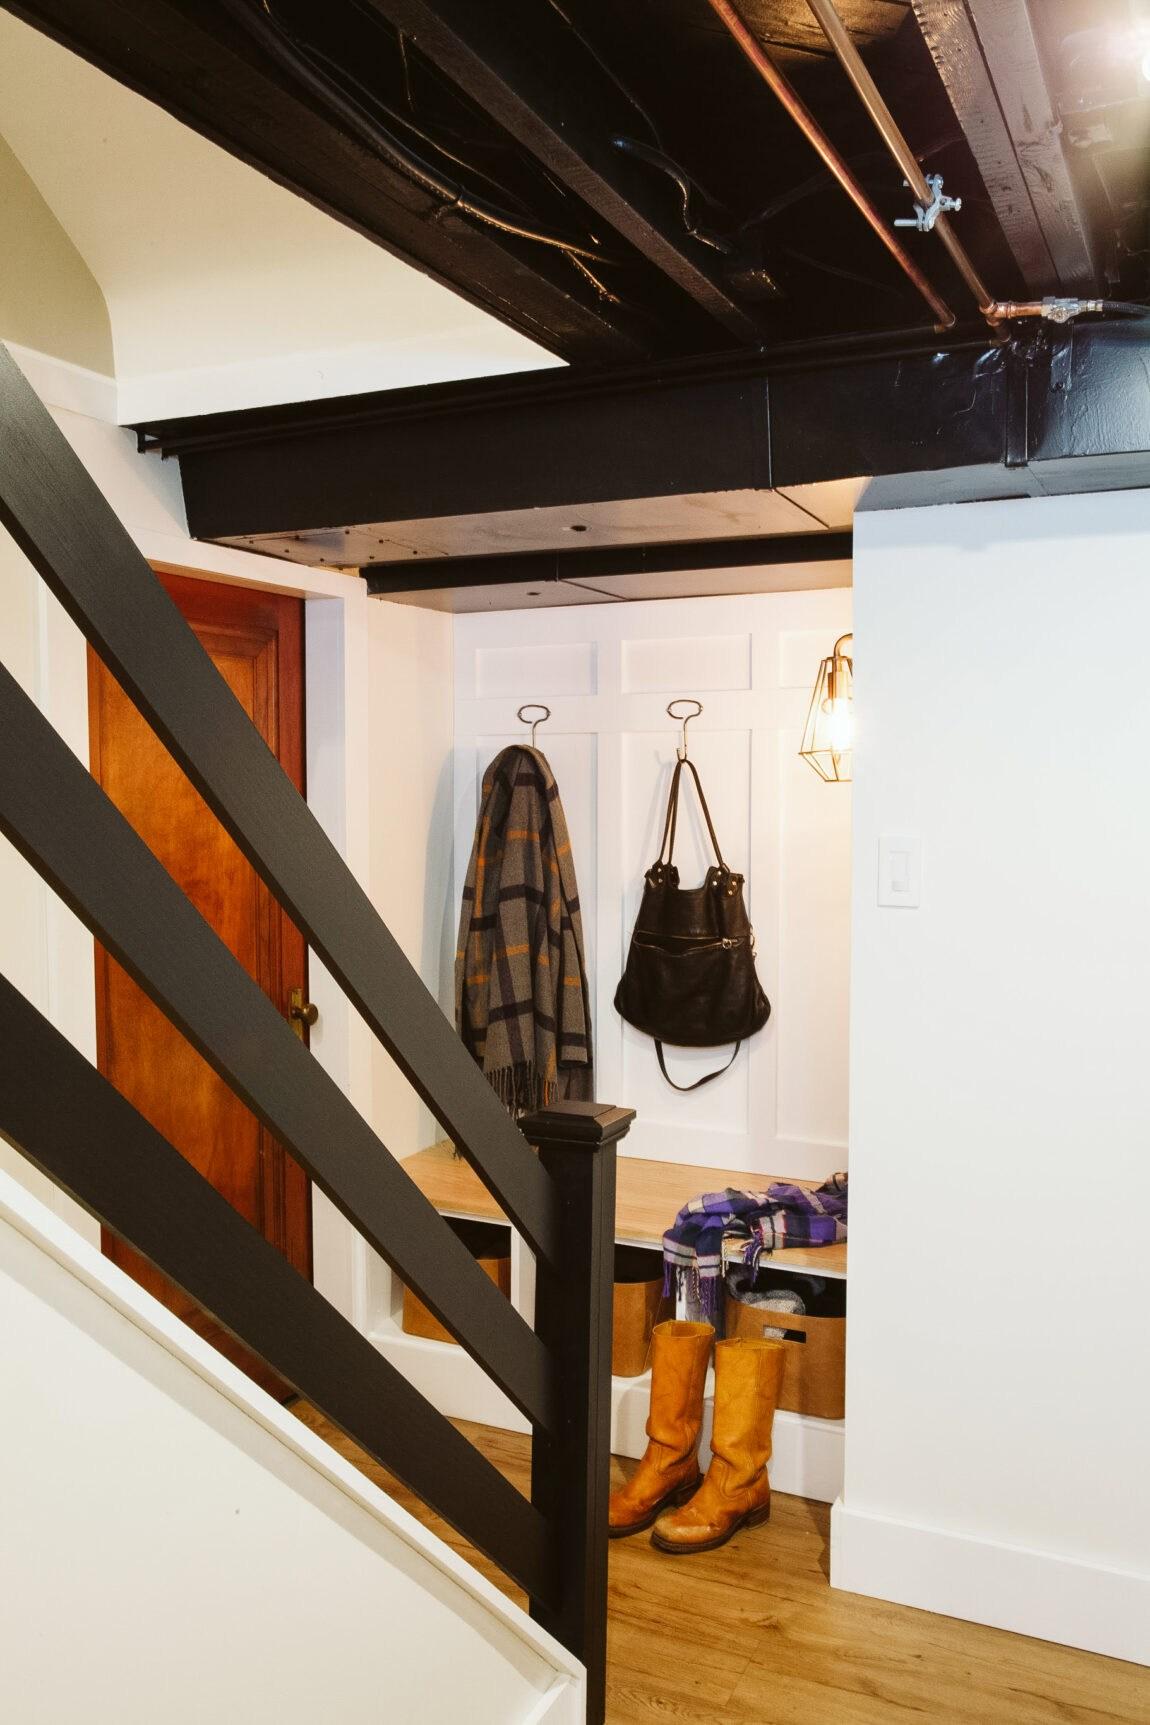 How To Build A Modern Horizontal Railing Clark Aldine   Stair Rails Near Me   Glass Railing   Deck   Stair Treads   Oak Stair Parts   Wood